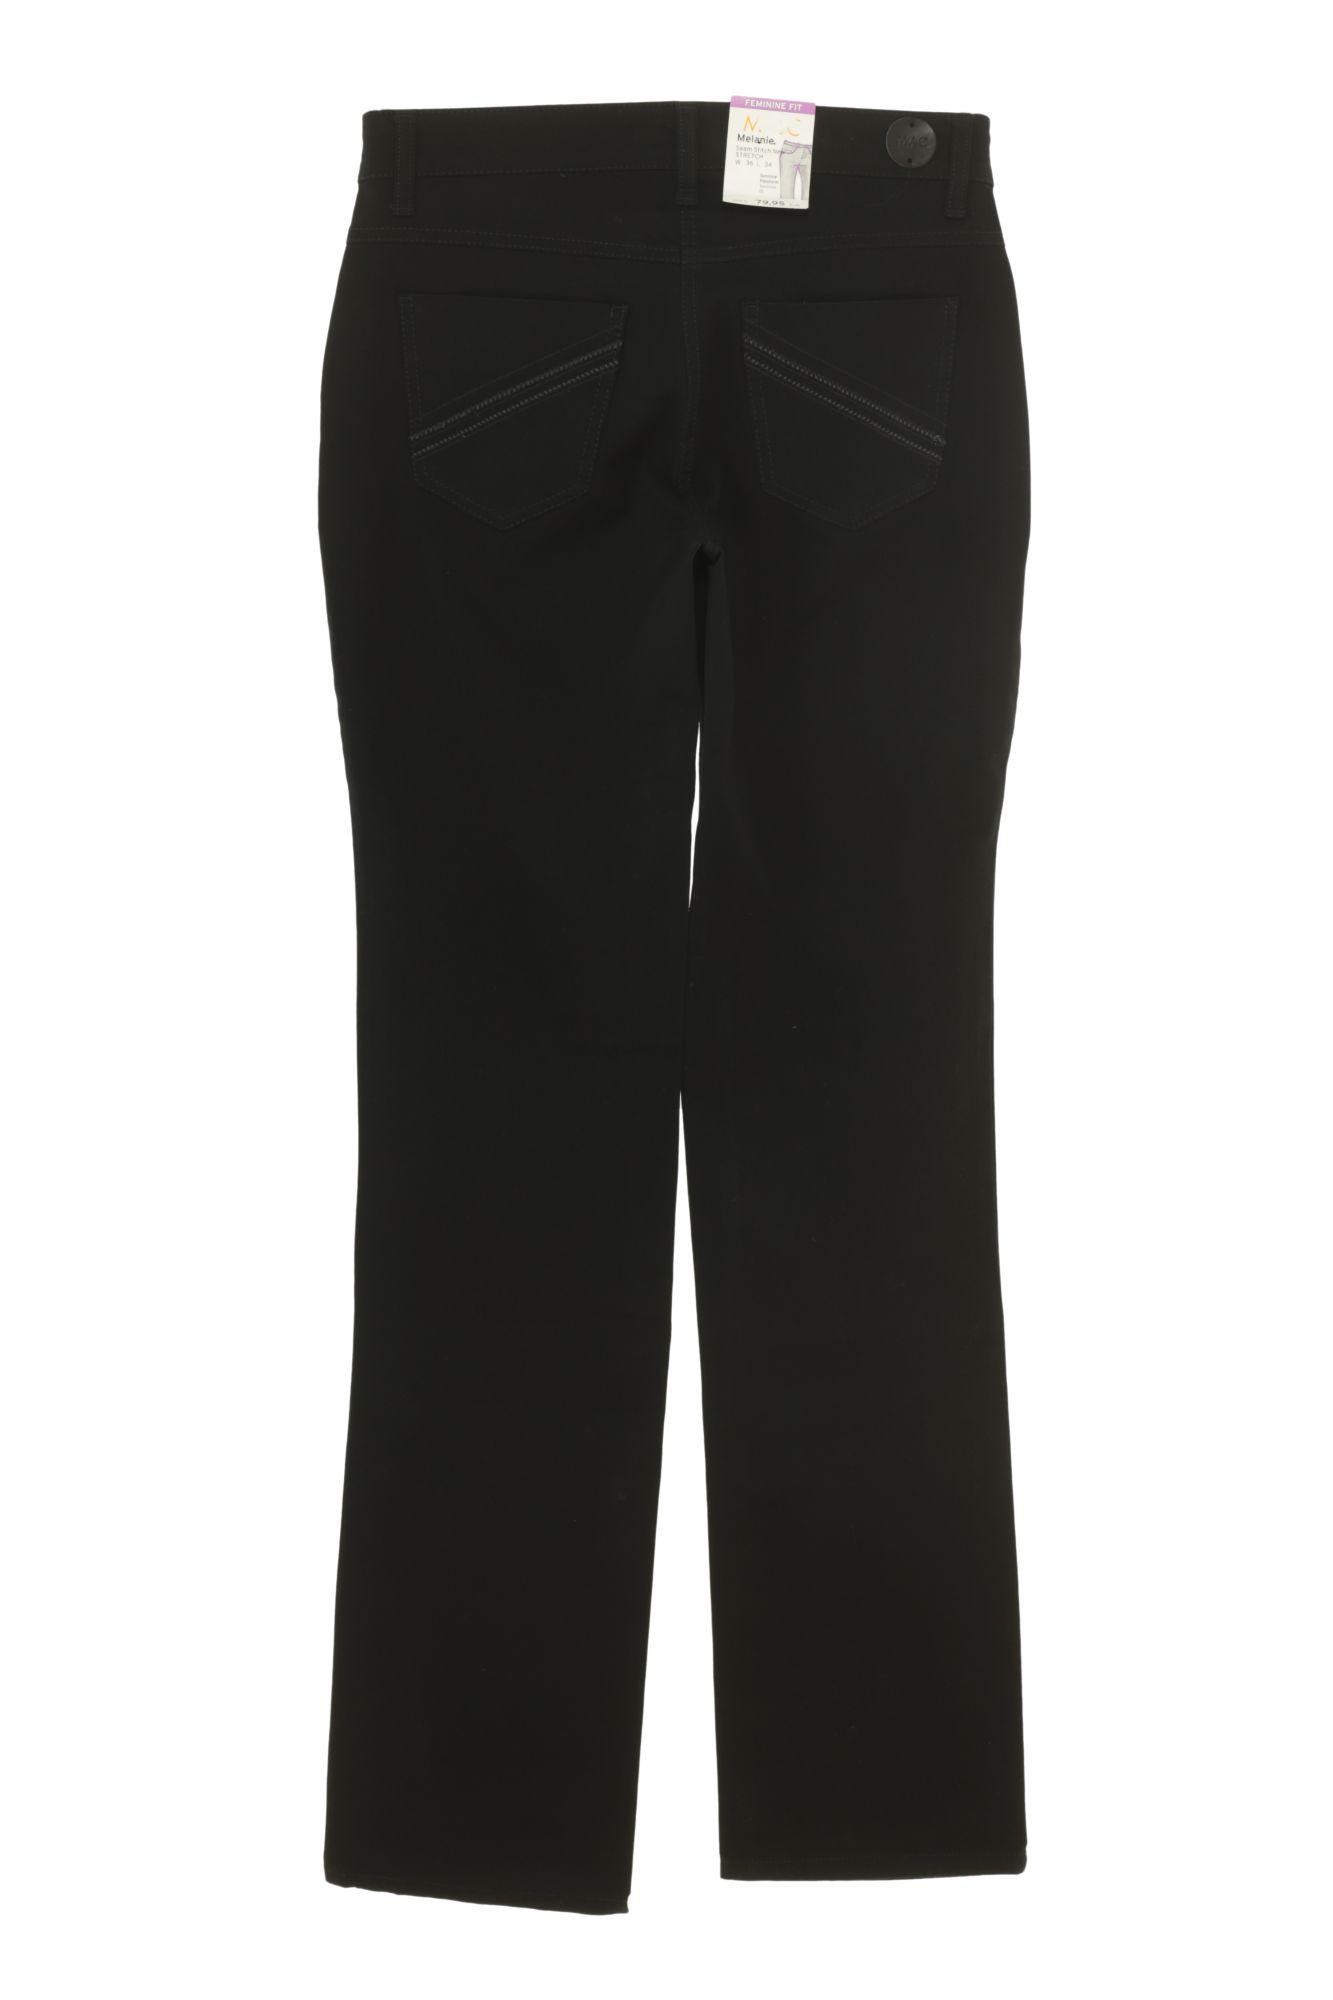 mac jeans melanie seam damen stretch gabardine ebay. Black Bedroom Furniture Sets. Home Design Ideas